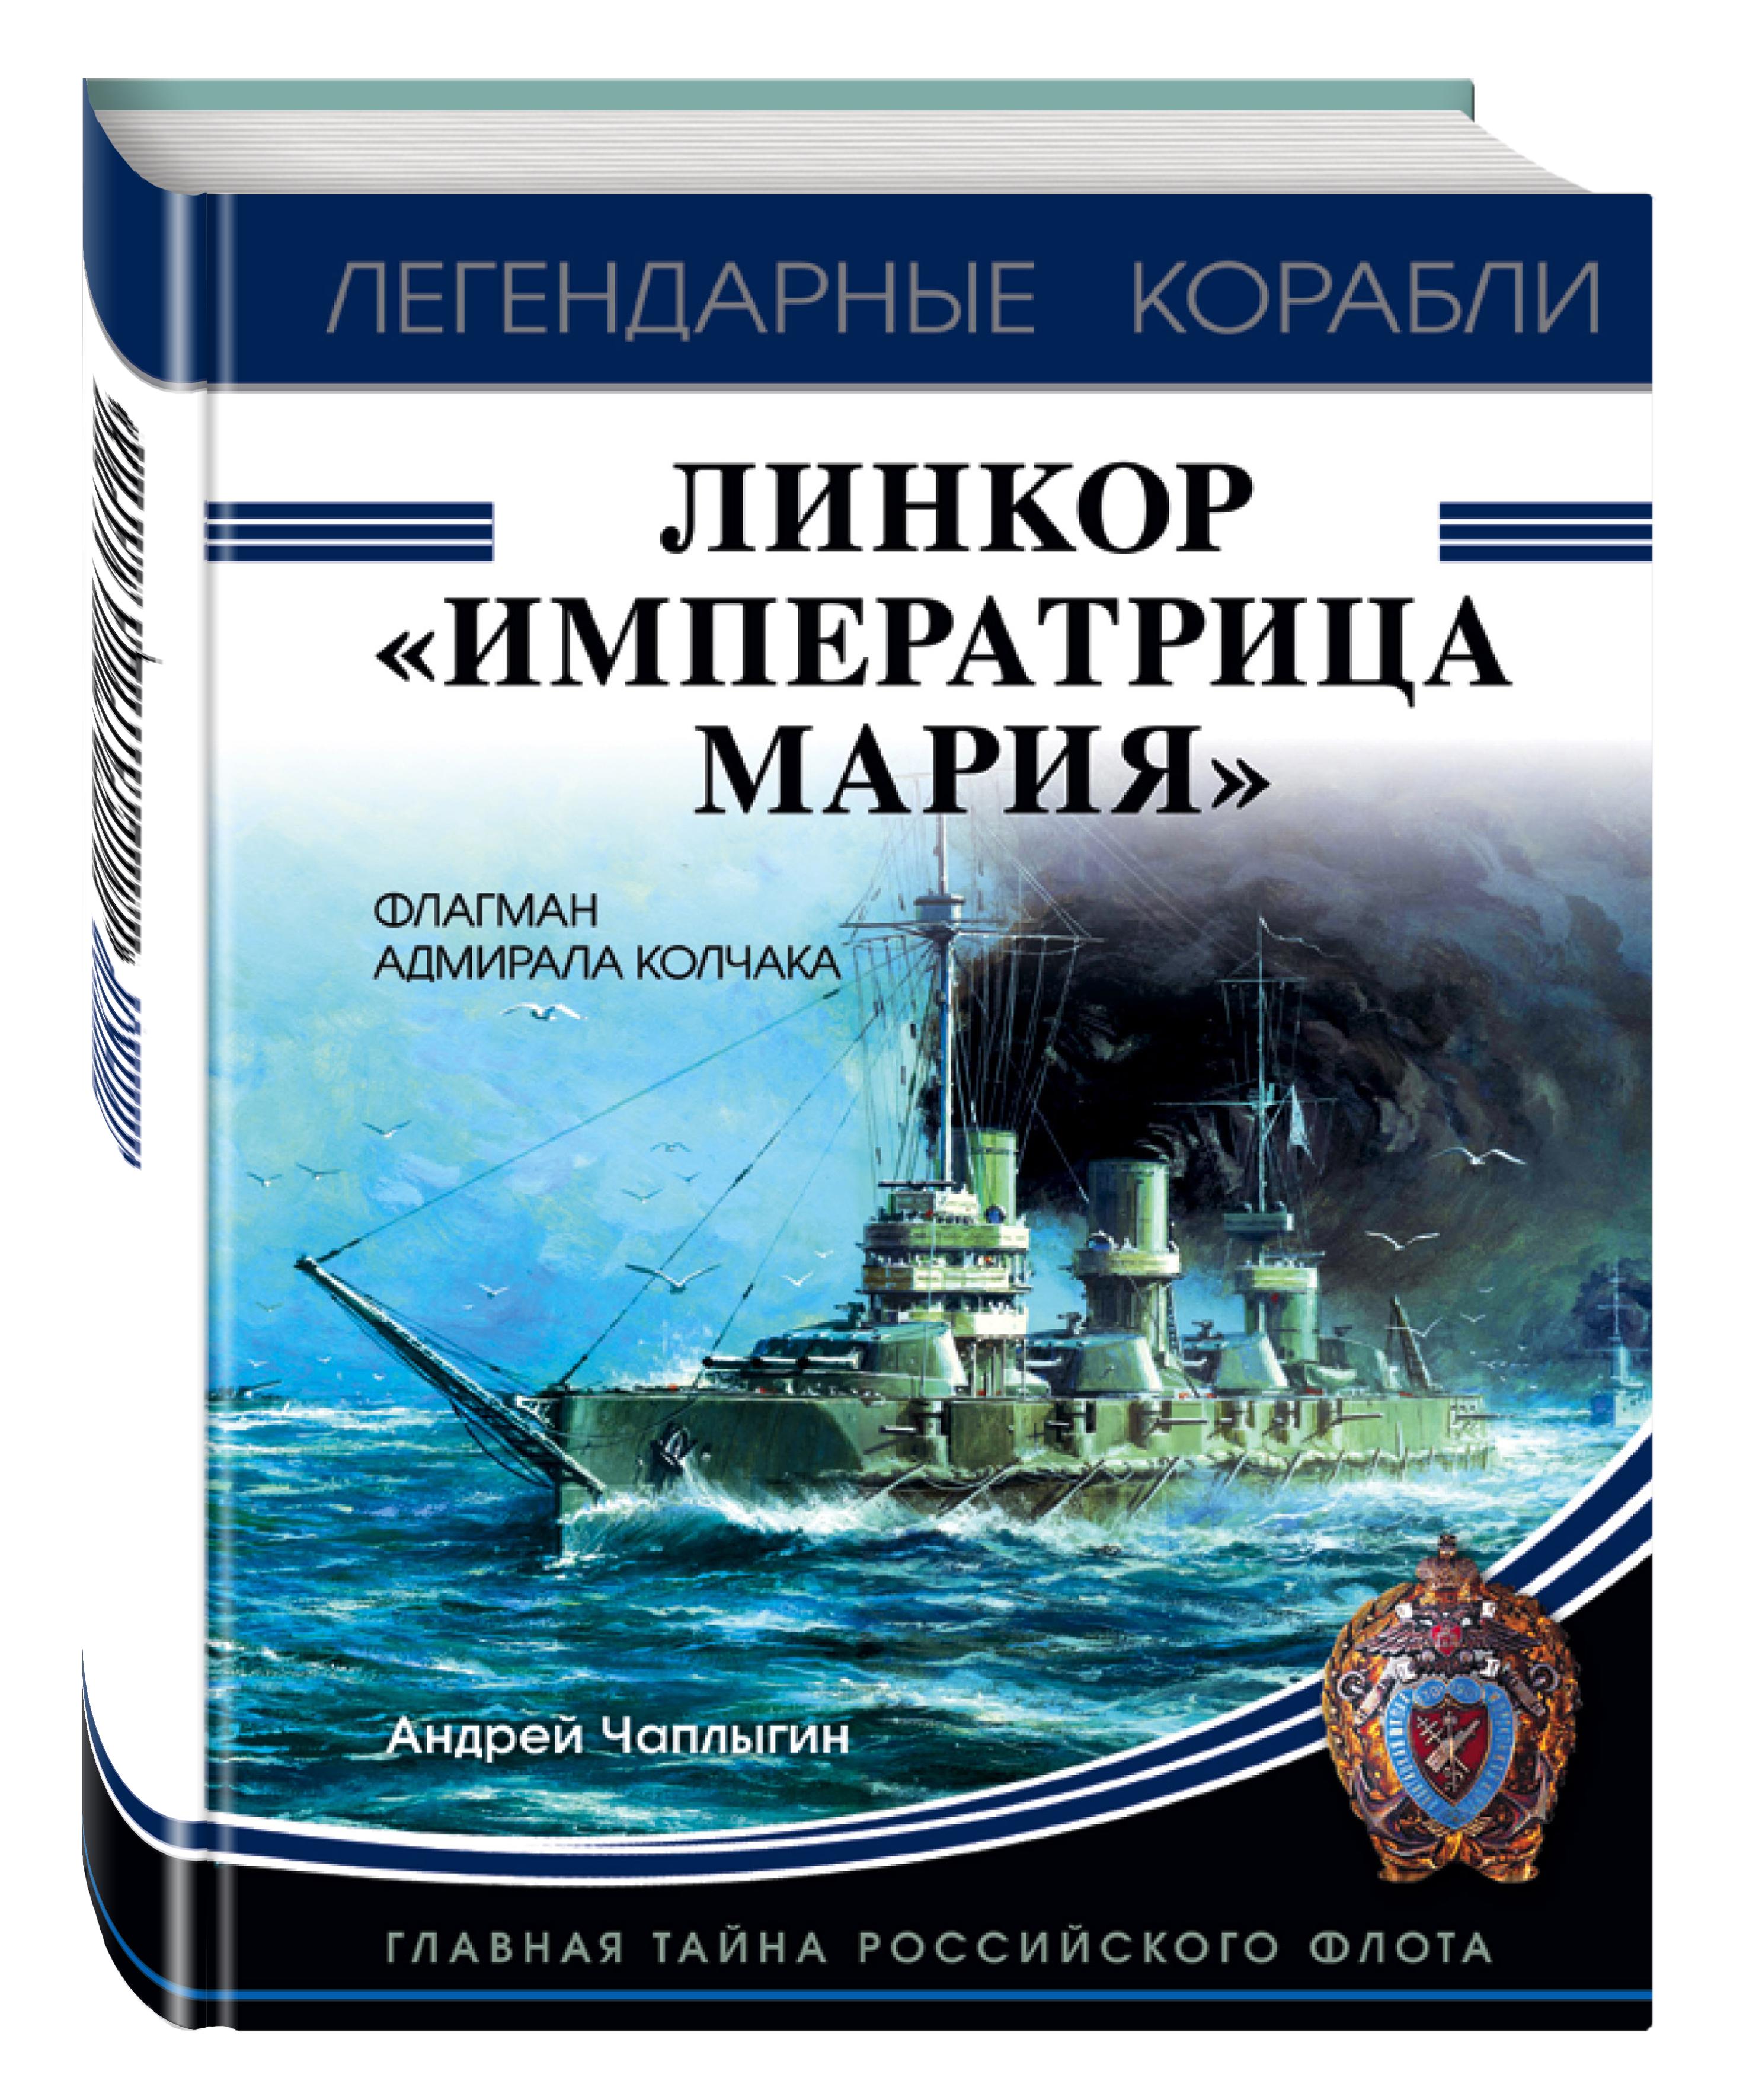 Чаплыгин А.В. Линкор «Императрица Мария» ISBN: 978-5-906716-95-8 121043 линкор гото предестинация 60x48x13см 1104932